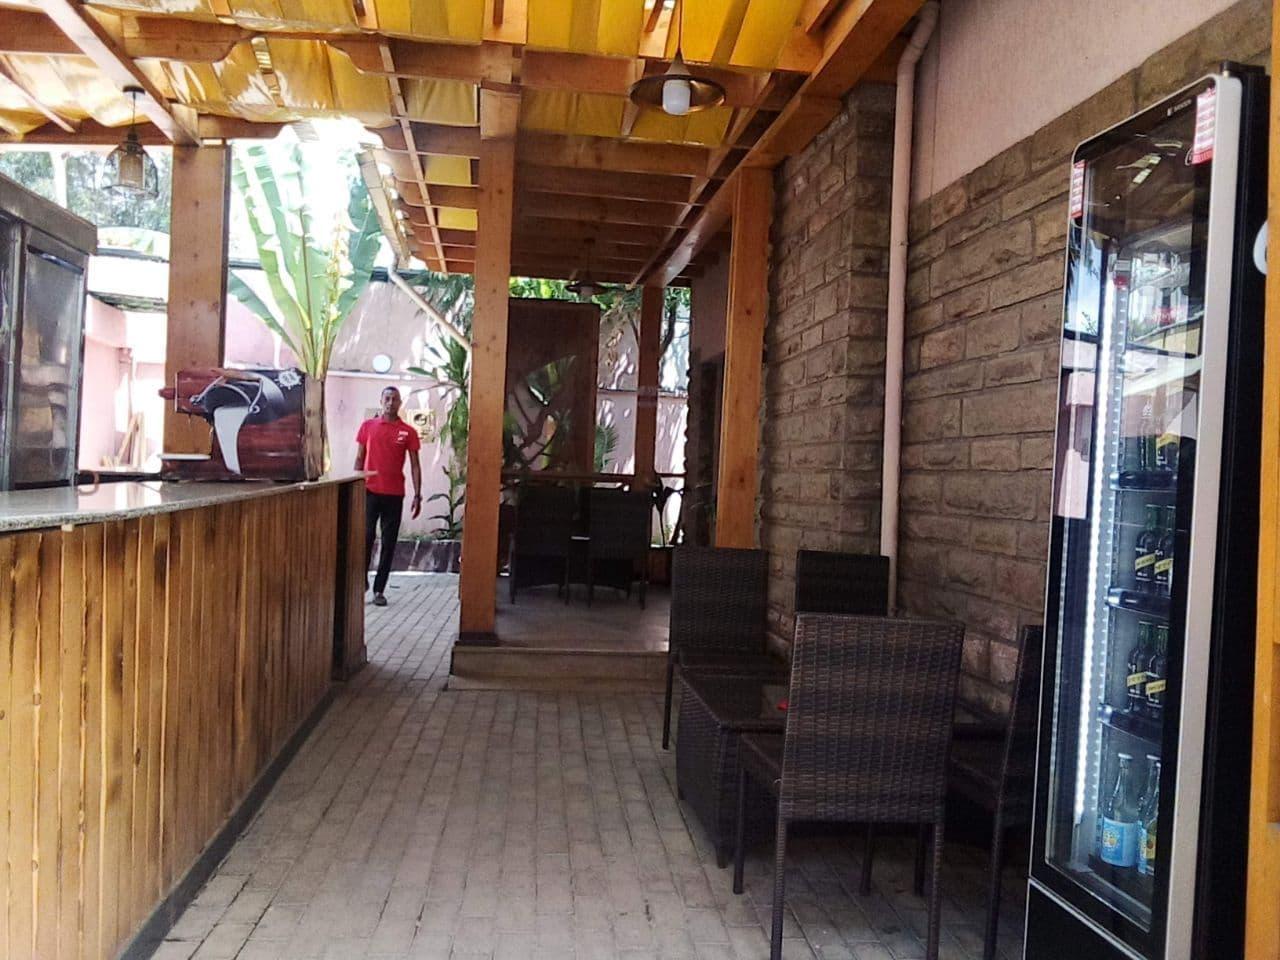 Hoish Alsamk Fish Restaurant